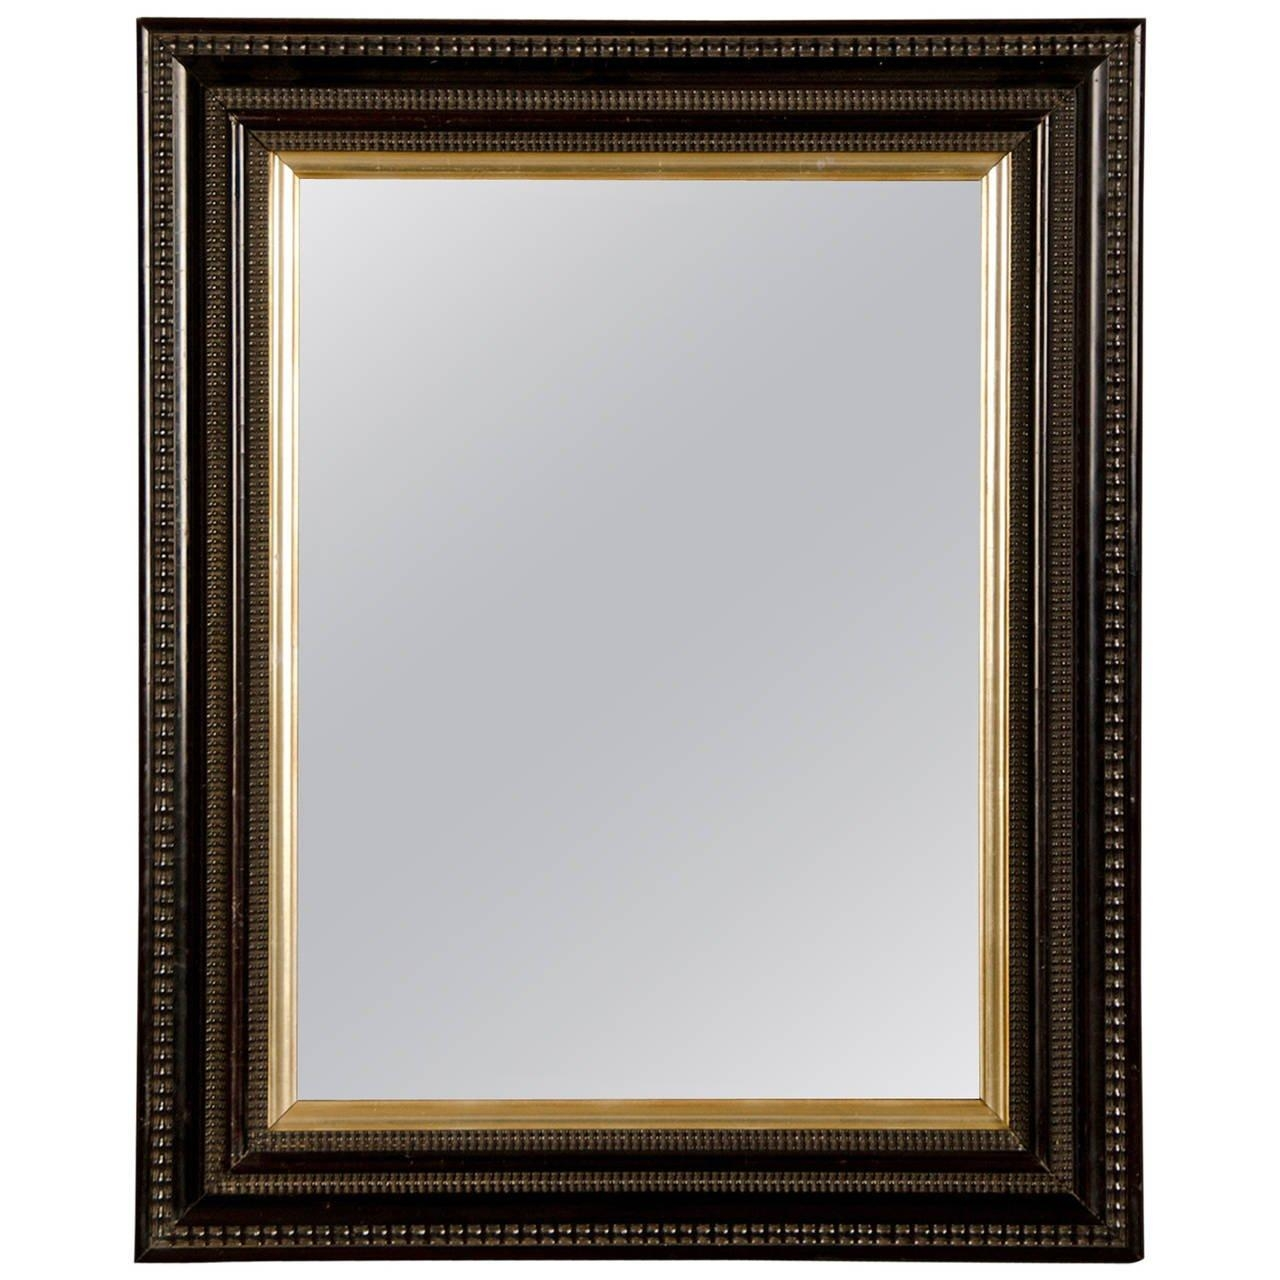 Rectangular Antique Dutch Black Frame Mirror, Circa 1875 At 1Stdibs With Regard To Black Antique Mirror (Image 17 of 20)